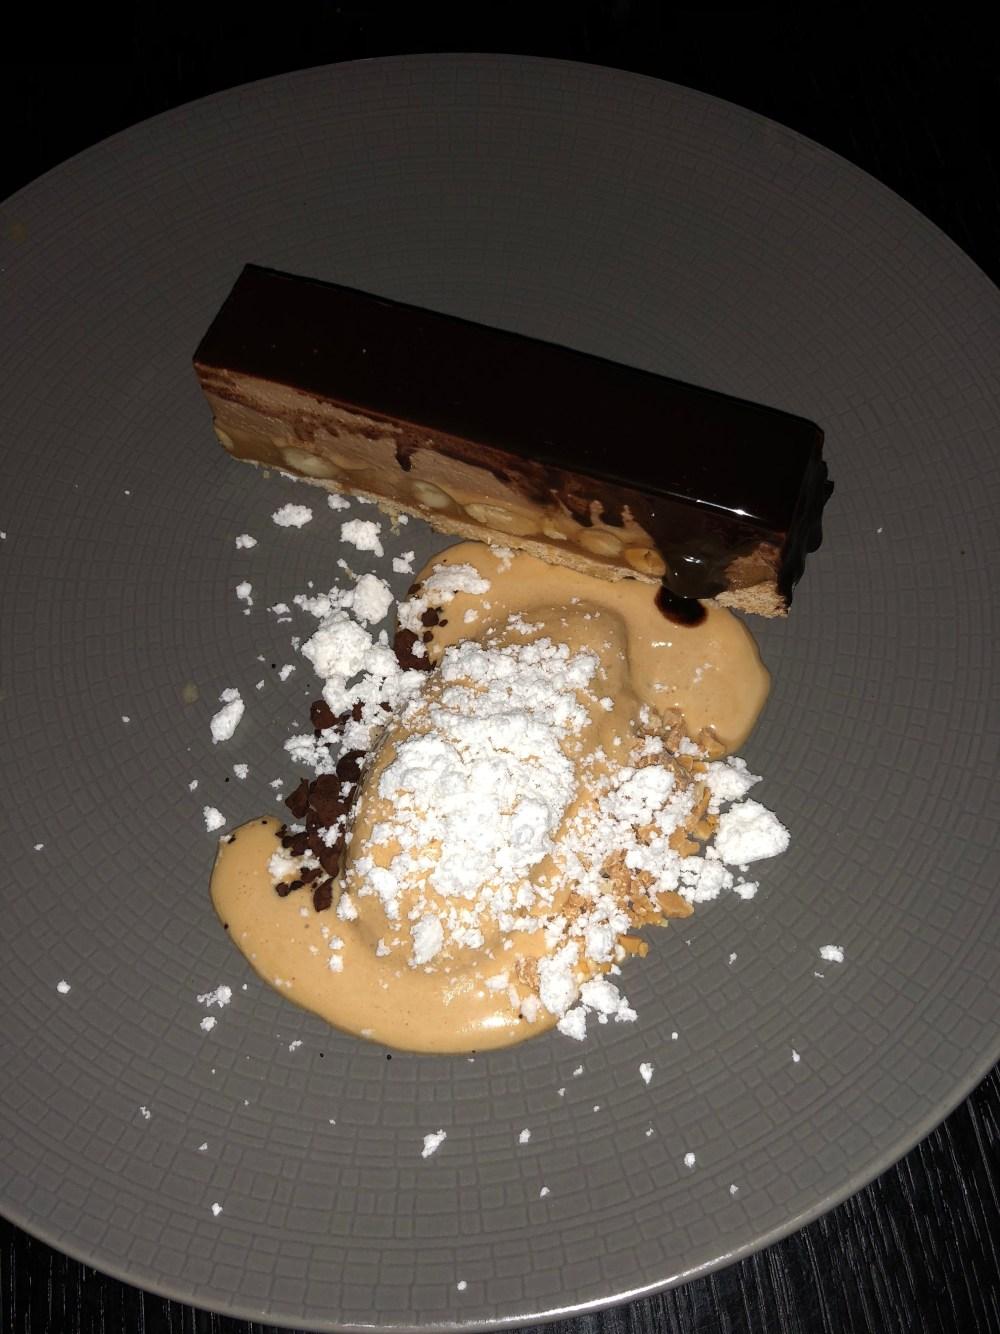 LondonsDiningCouple M Threadneedle Street  Top 10 Desserts in London